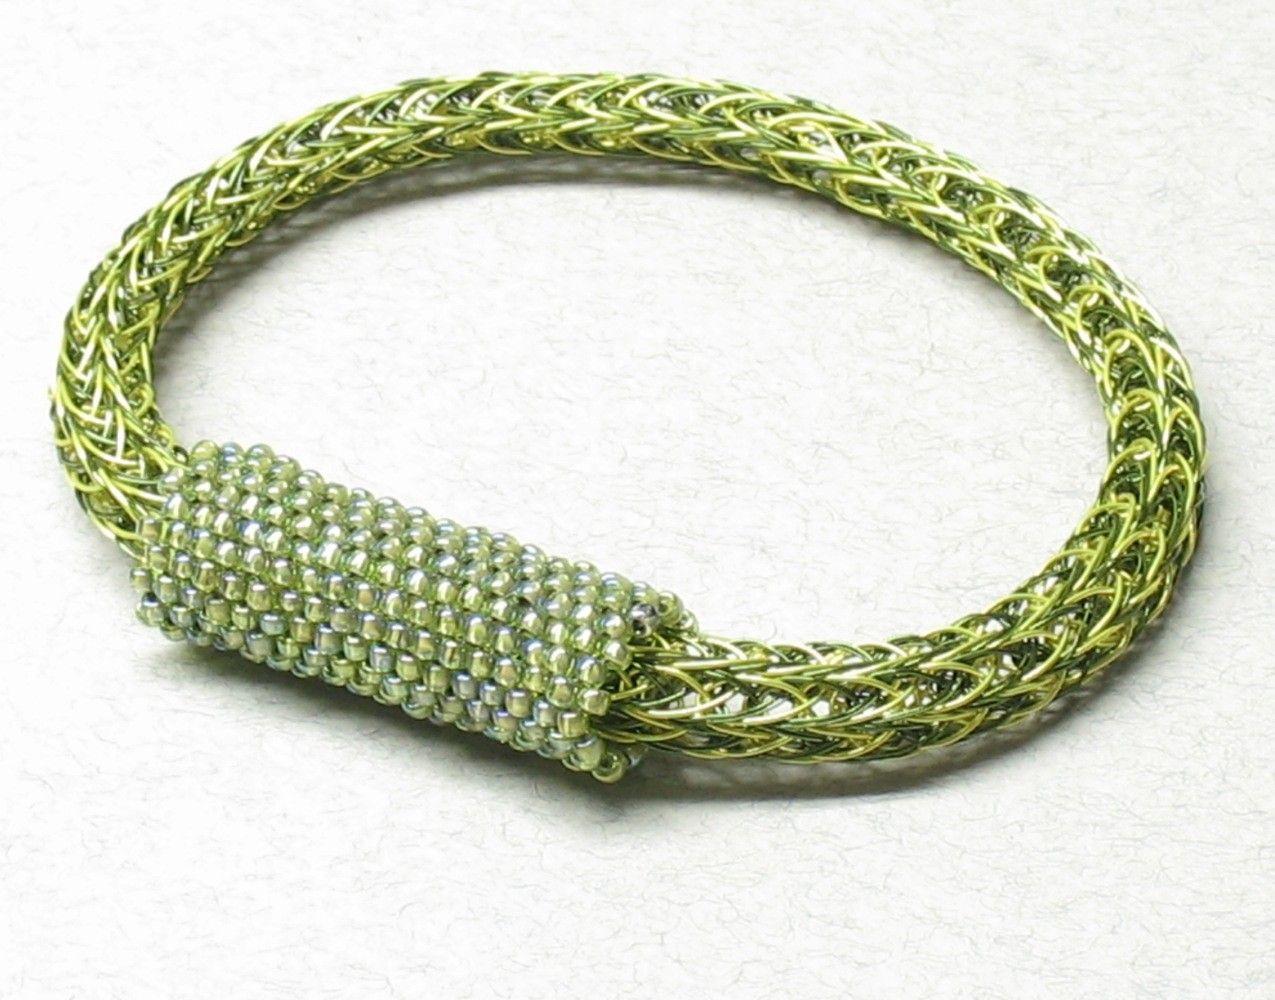 Chartreuse Woven Wire Viking Knit Bracelet. $35.00, via Etsy ...